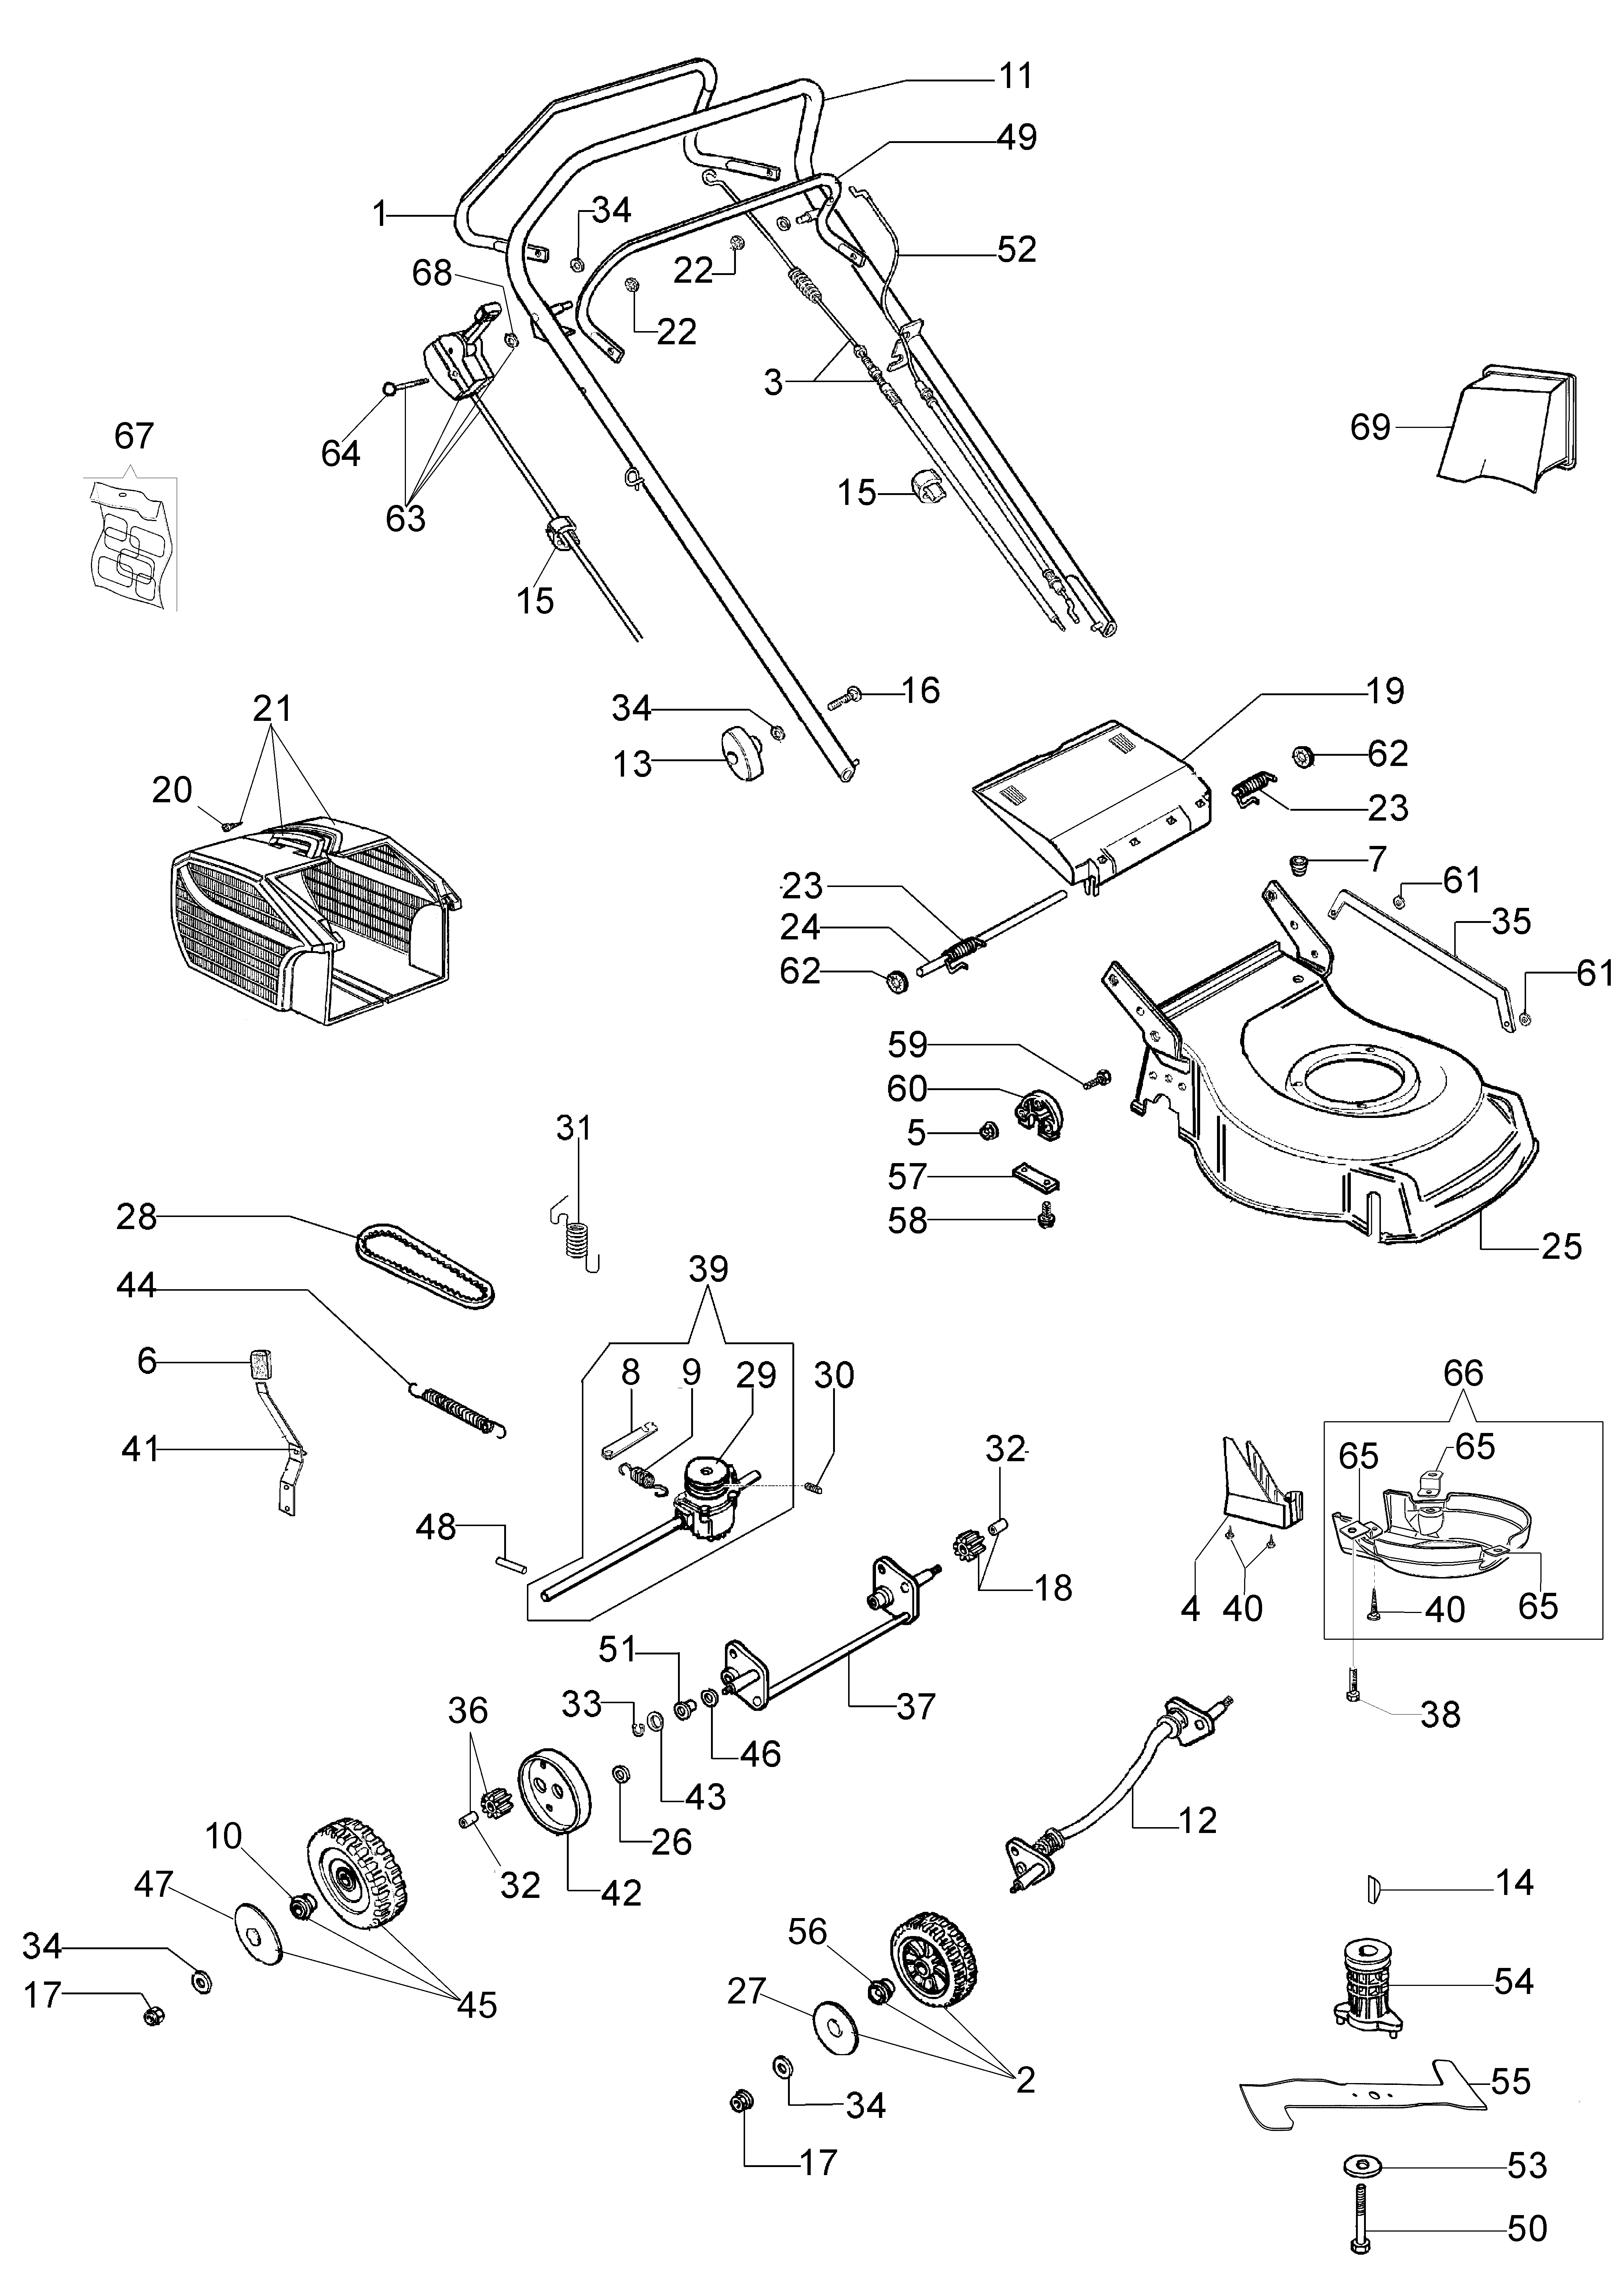 G 48 TK (K50) Oleomac Dessins pièces -  Vue éclatée